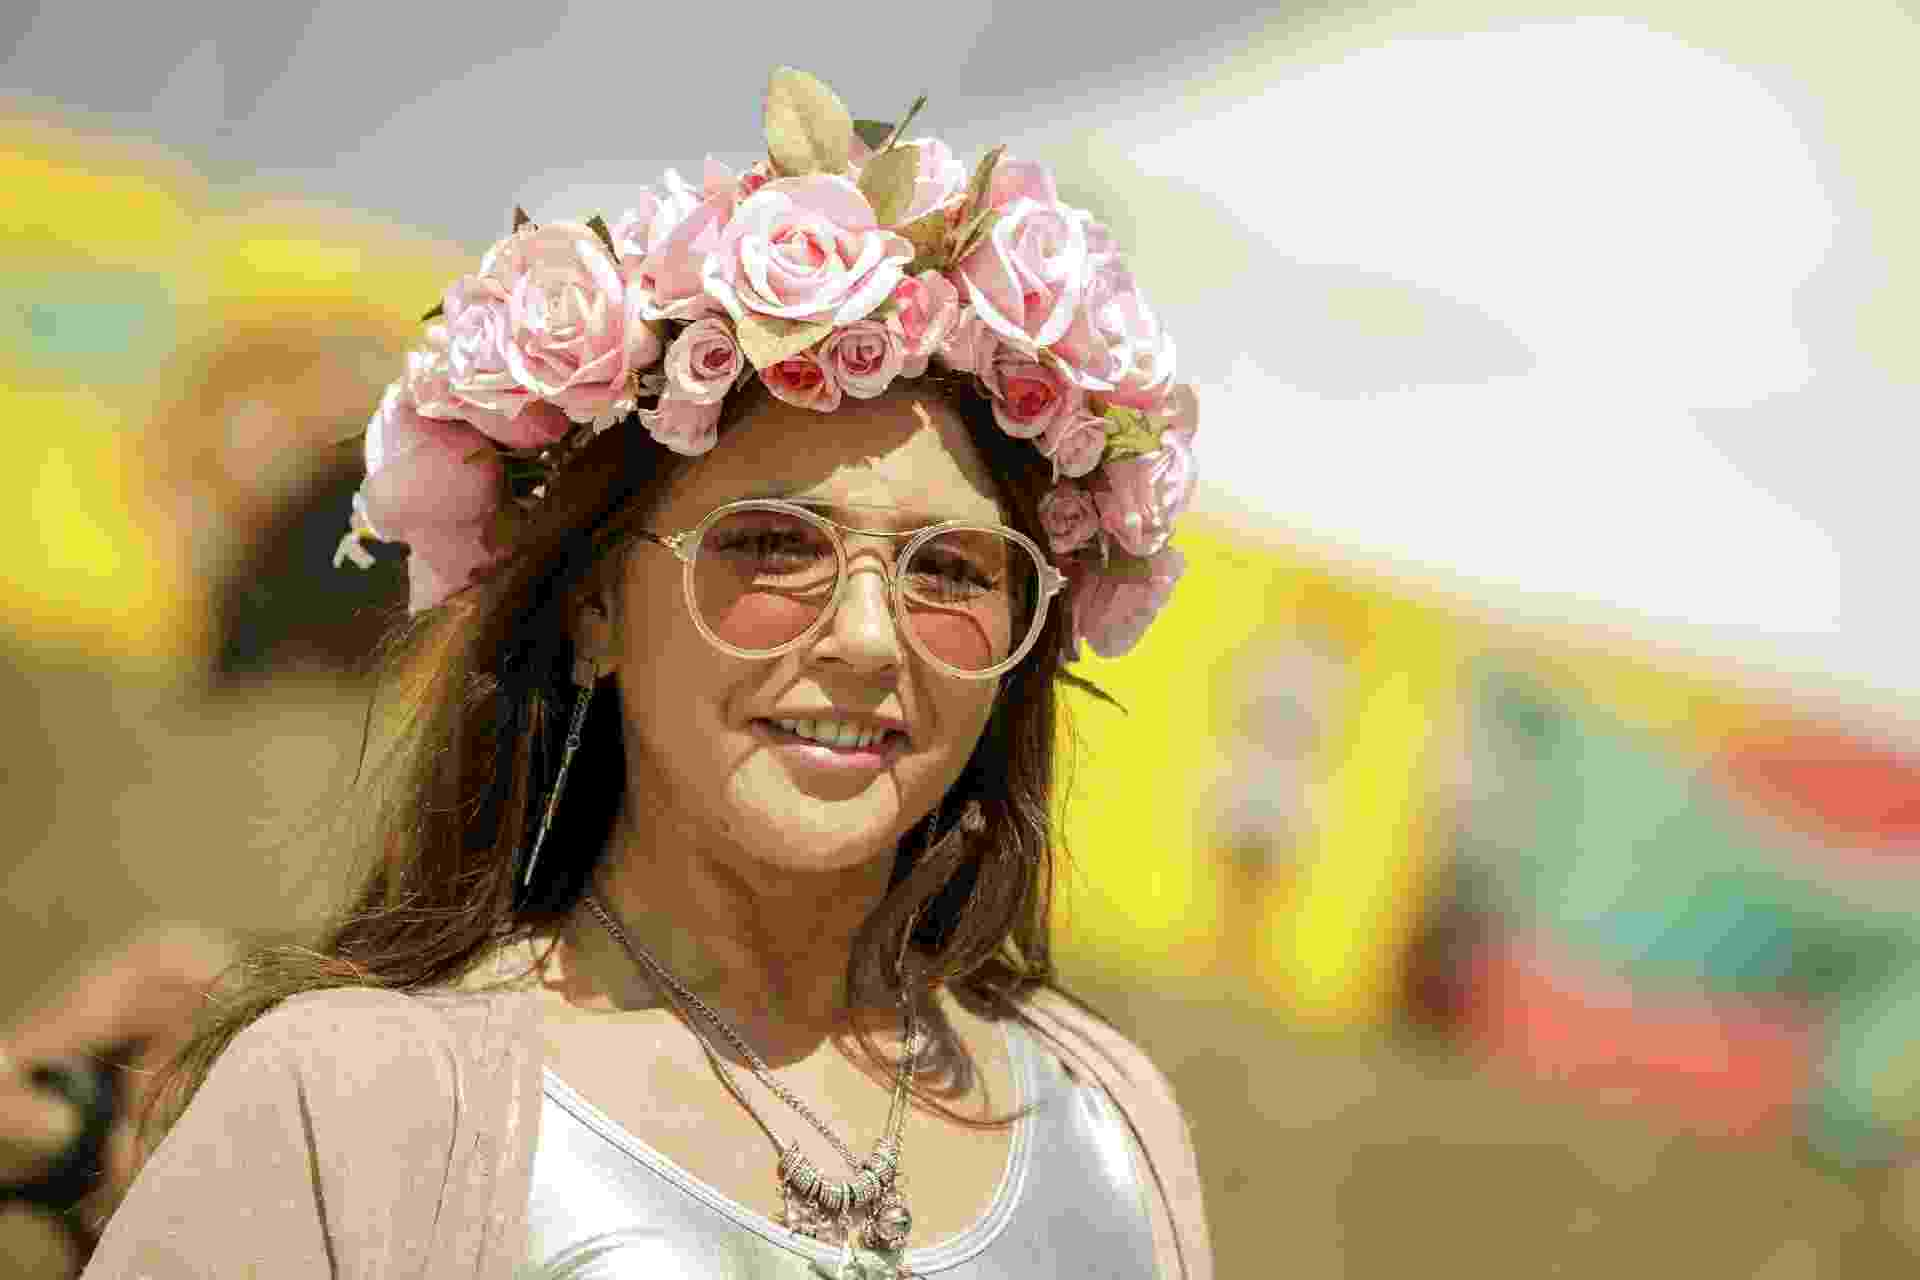 Maria Lima Macedo com coroa de flores para assistir ao show de Lana Del Rey no Lollapalooza Brasil 2018 - Mariana Pekin/UOL